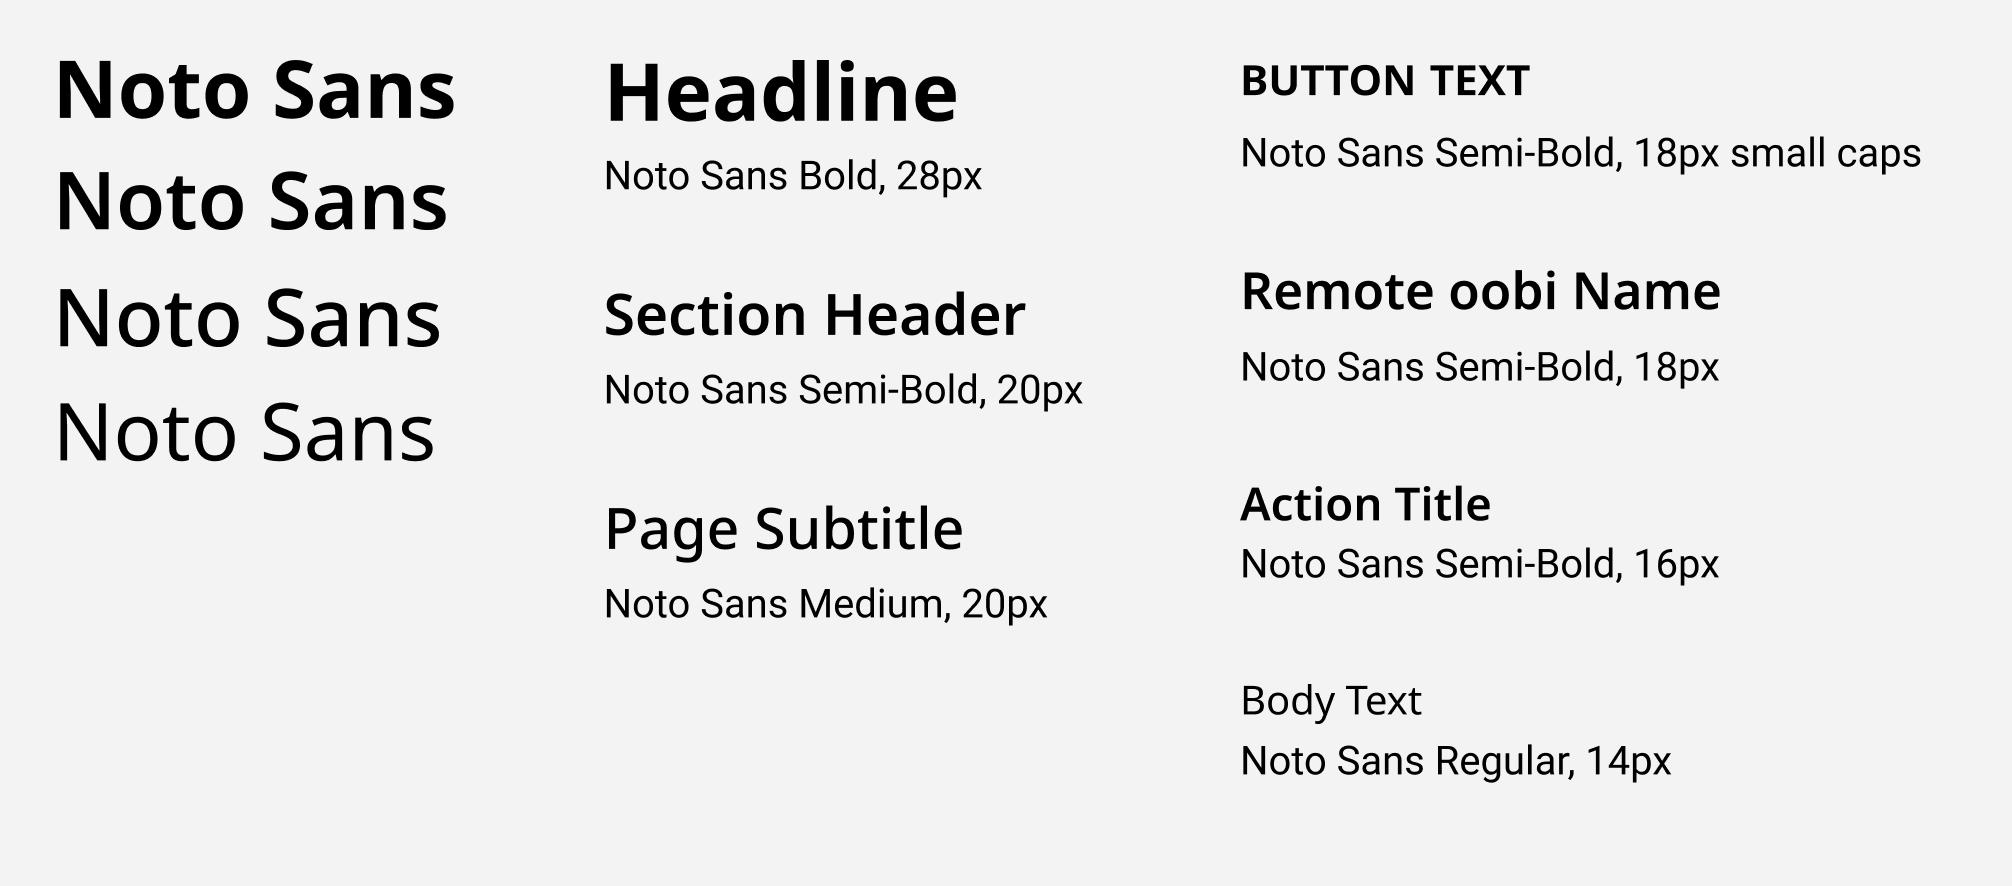 Oobi visual system typographic hierarchy